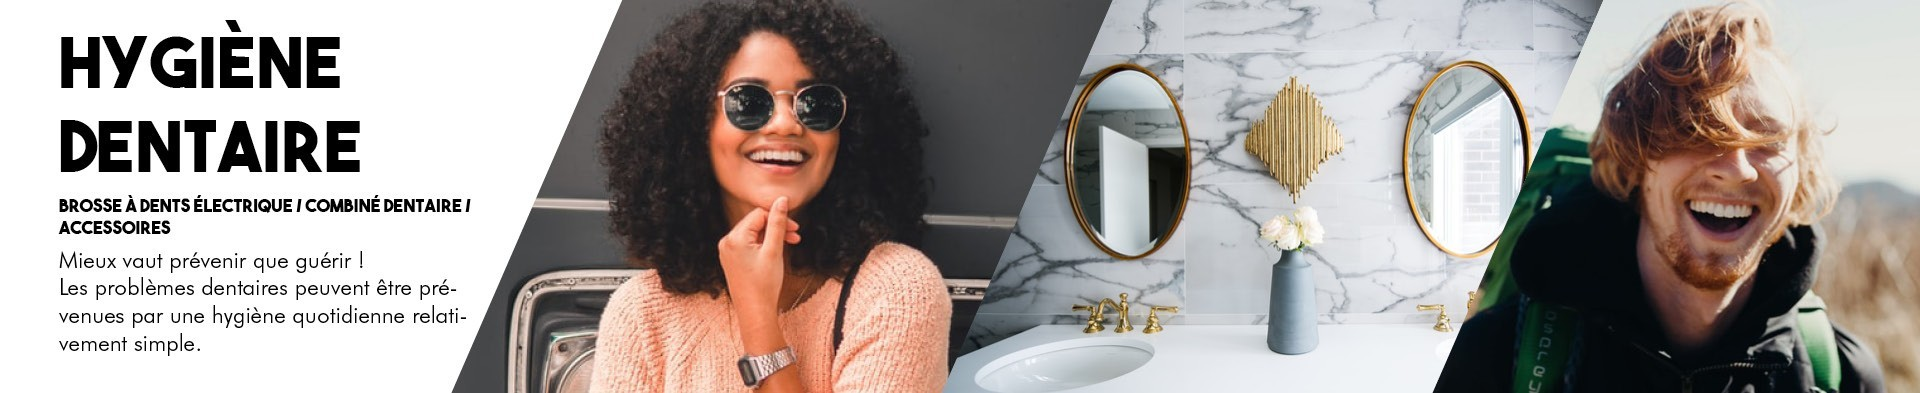 Hygiène dentaire | BlackPanther.fr